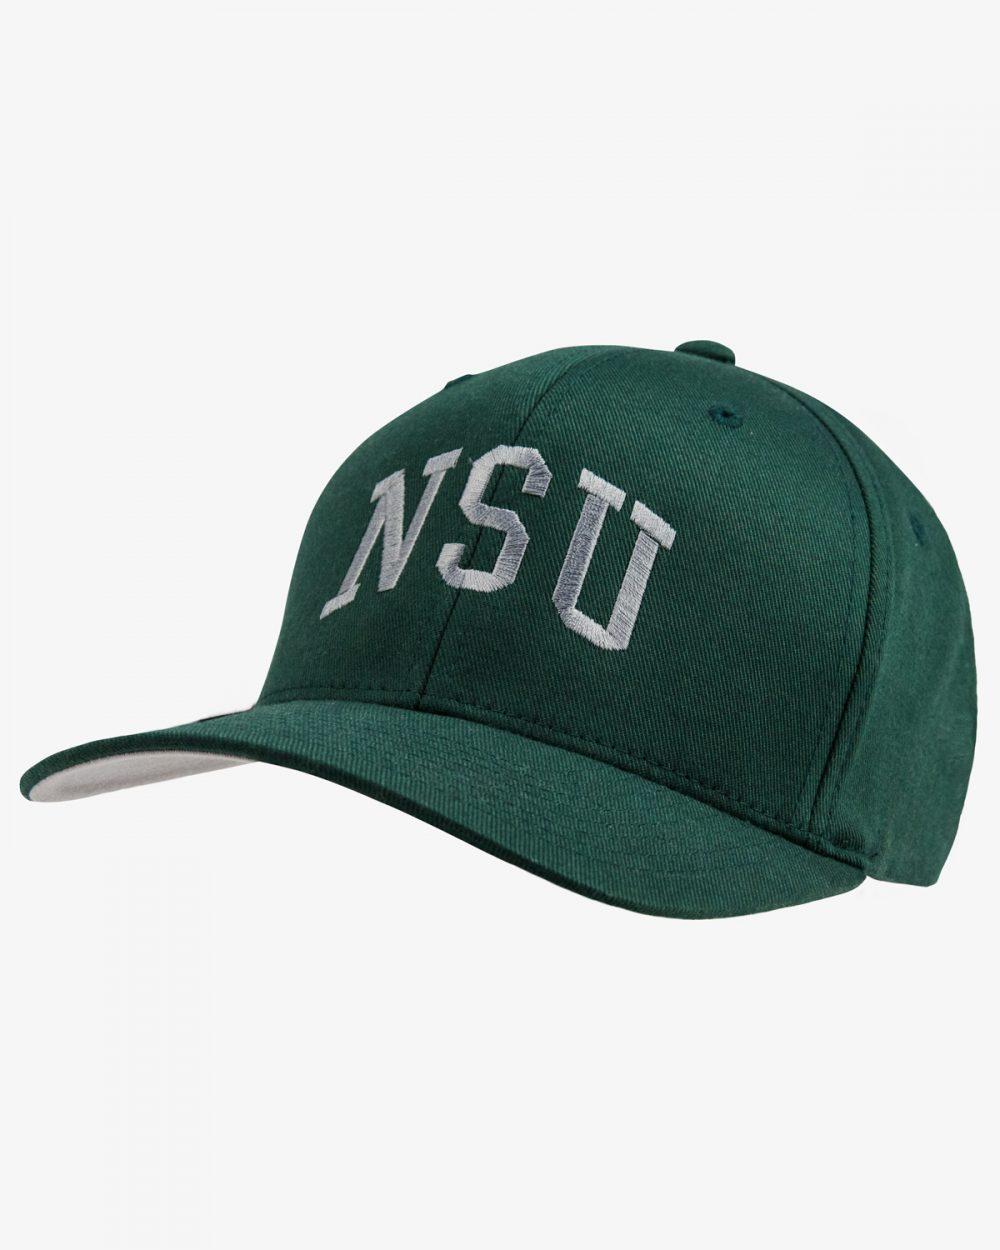 Performance Baseball Hat 521 Green